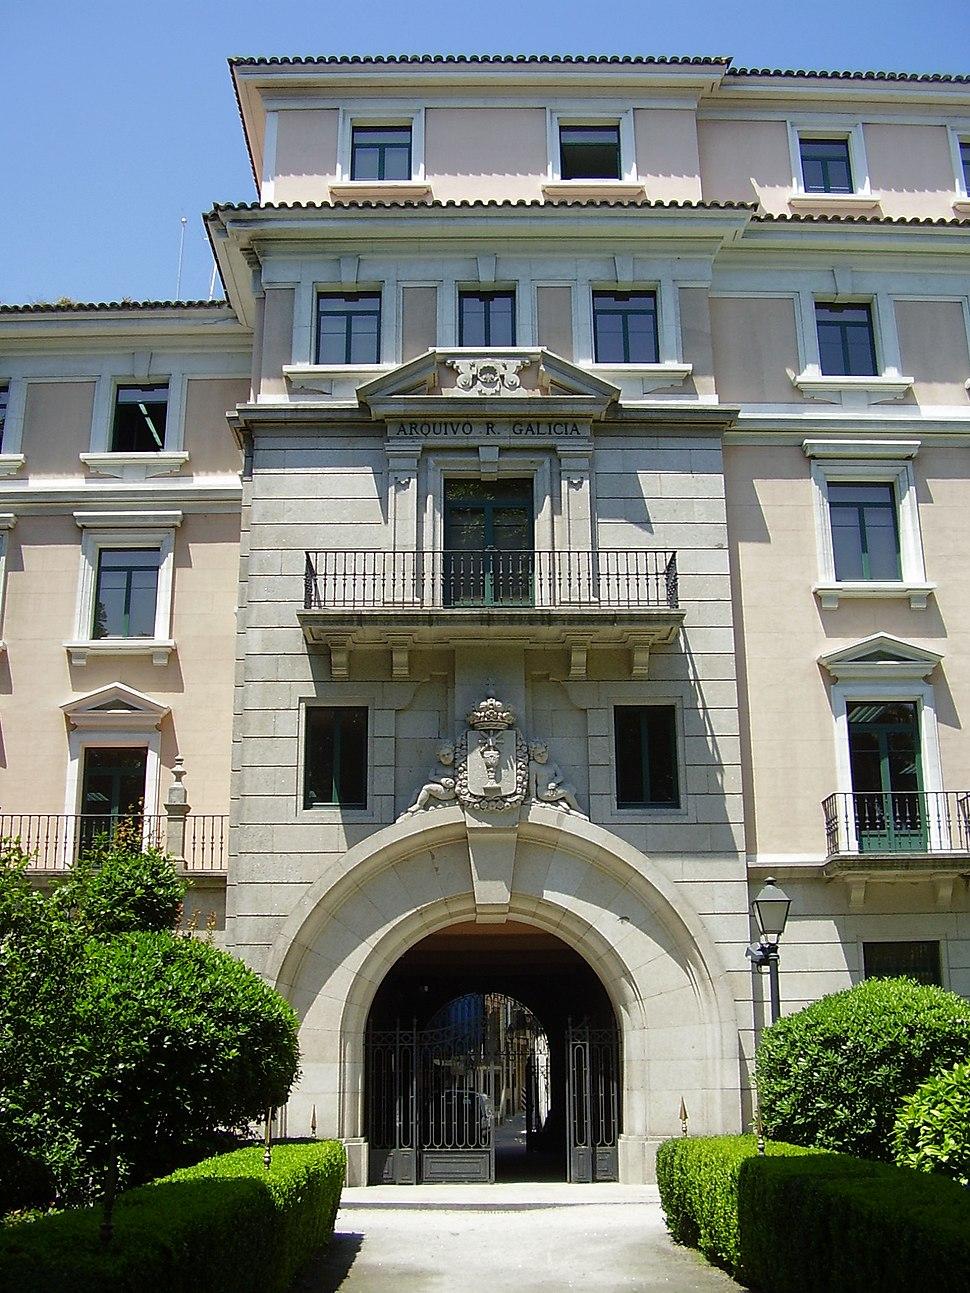 Frente del Archivo del Reino de Galicia